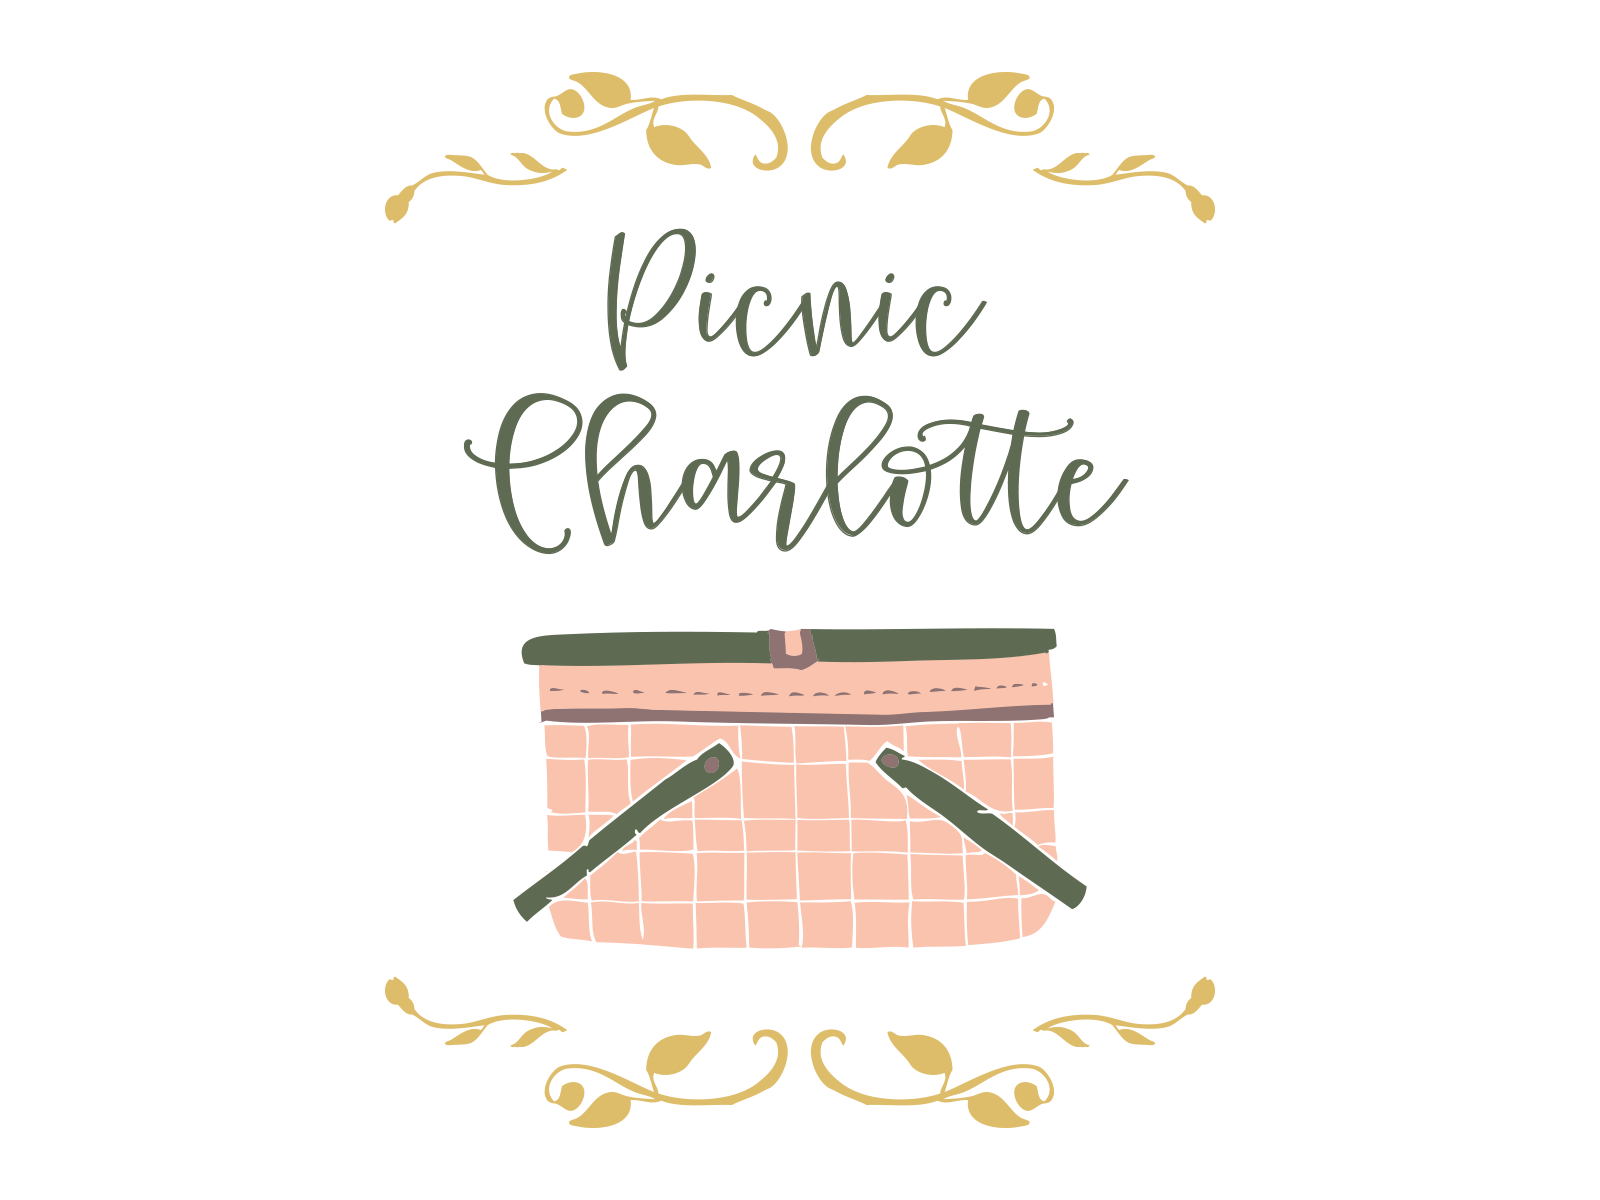 Picnic charlotte